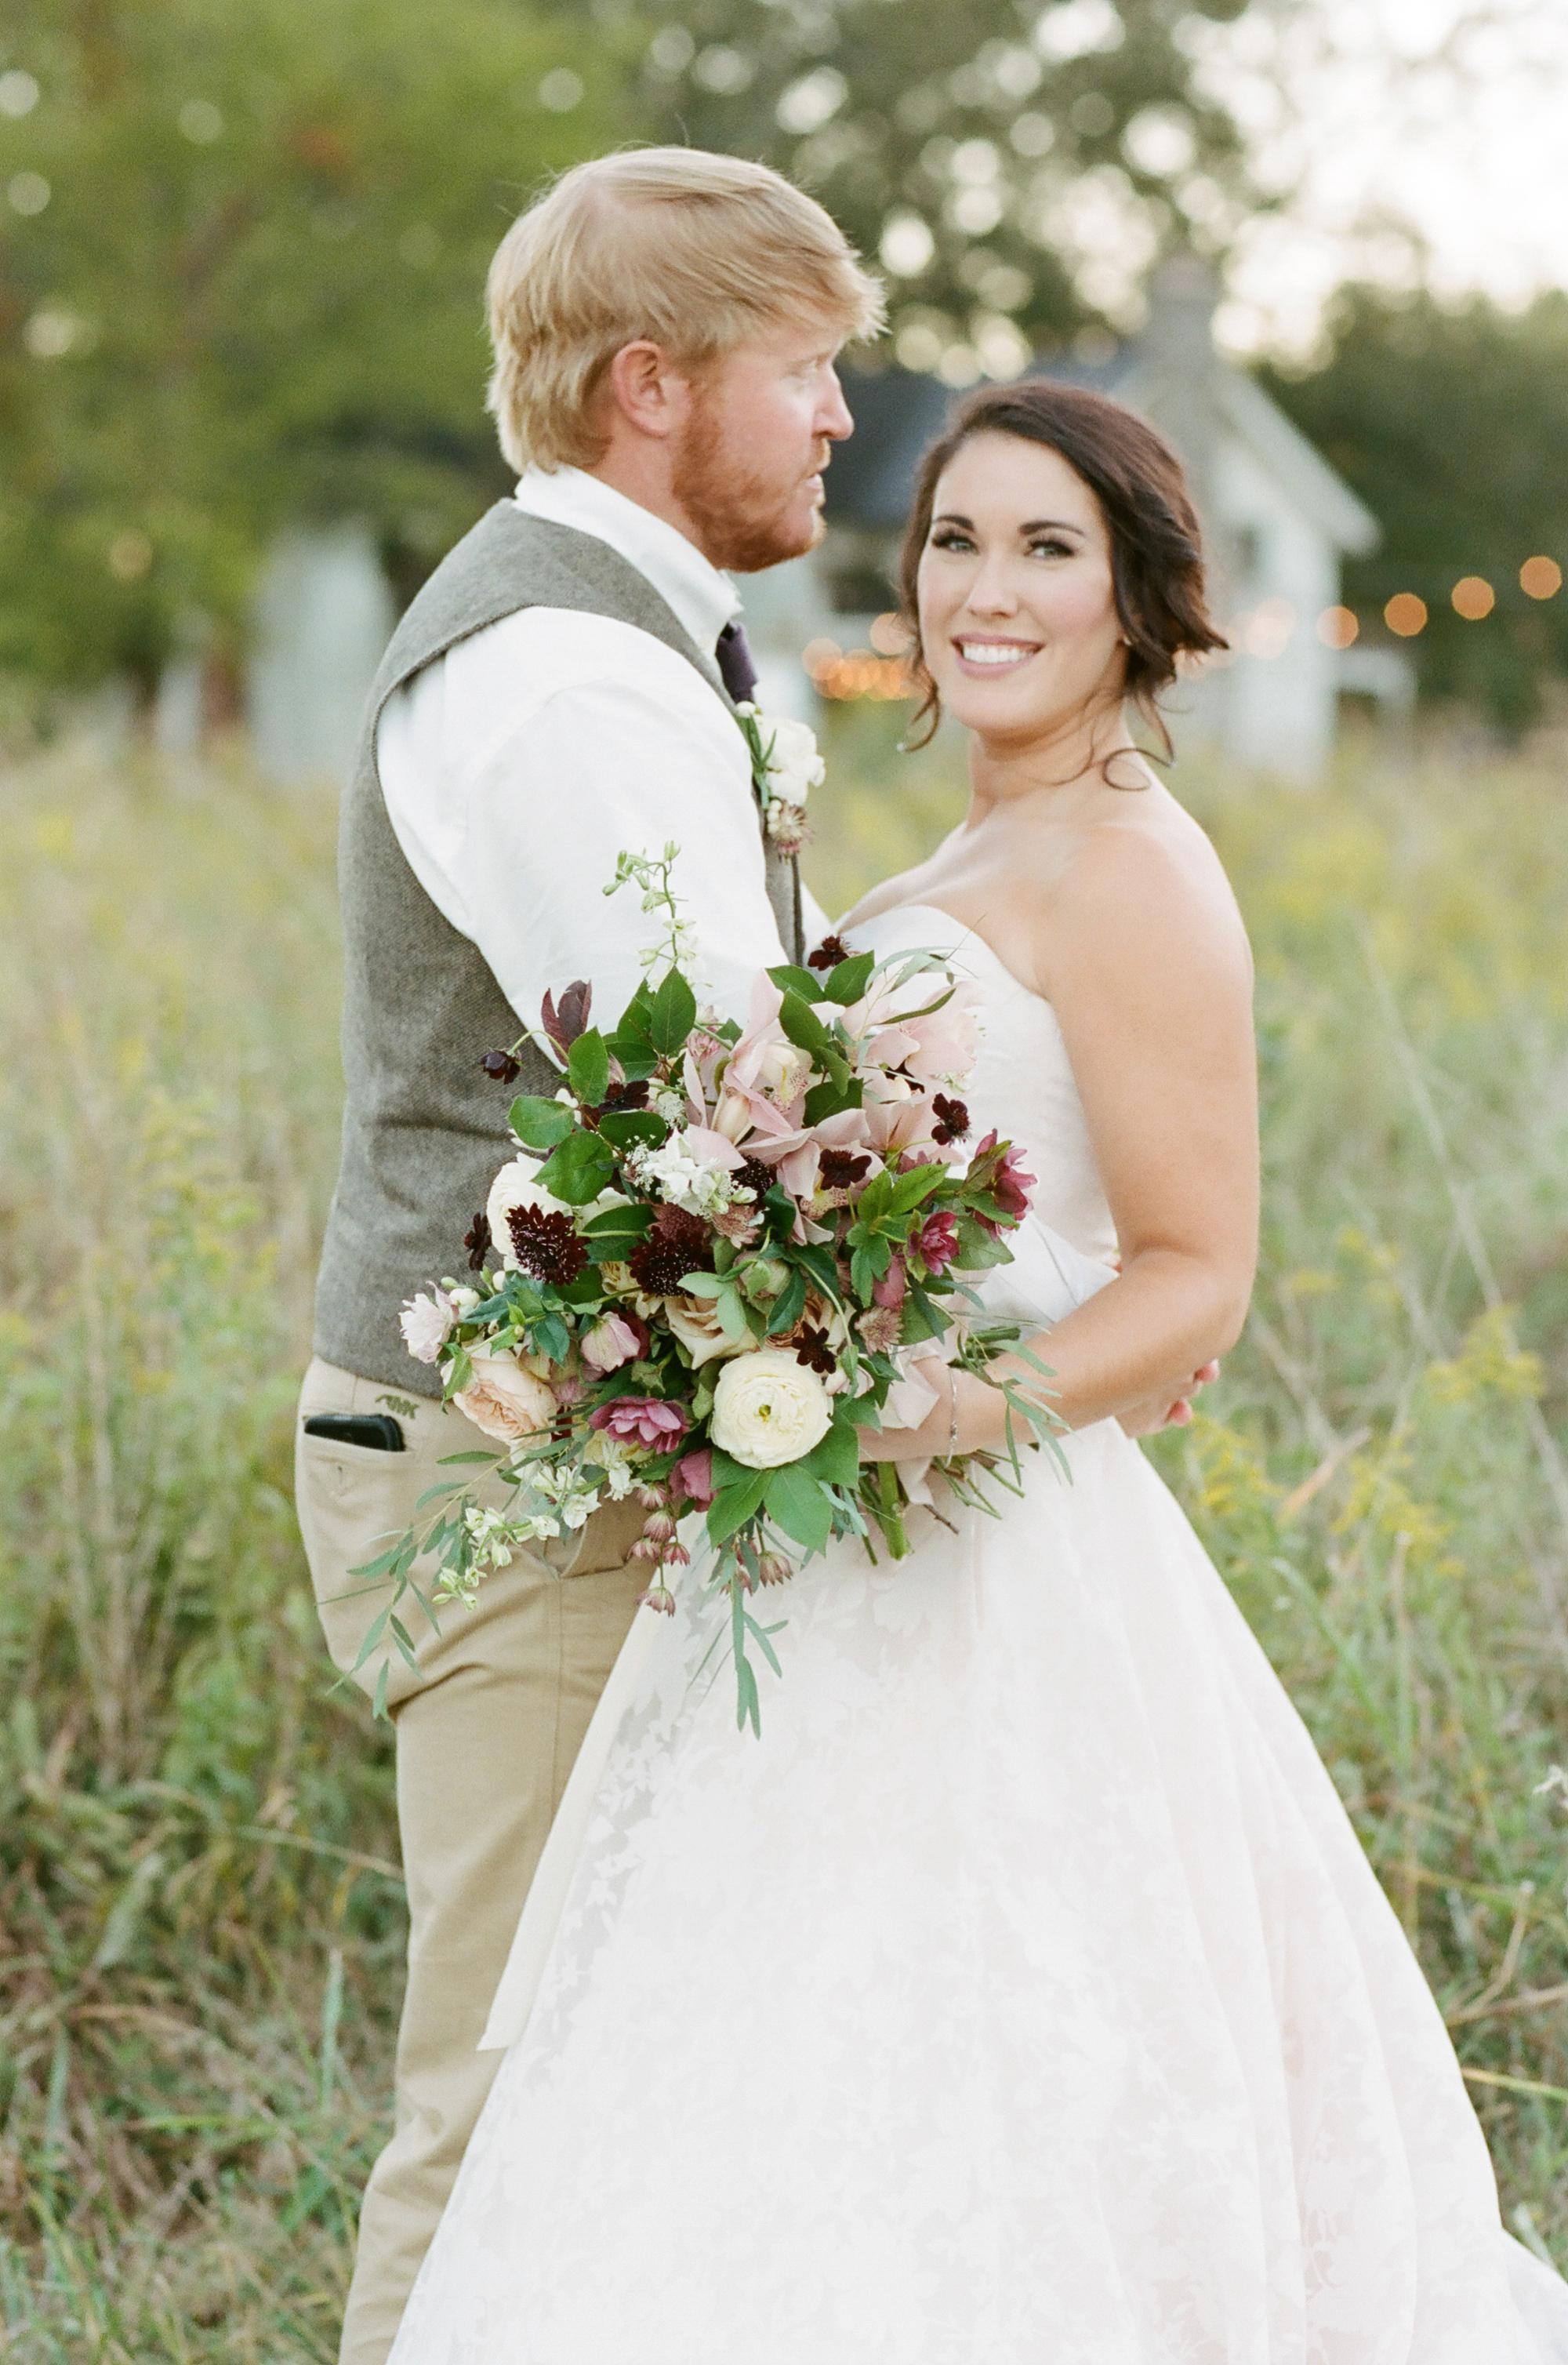 southern-weddings-film-photographer_0058.jpg